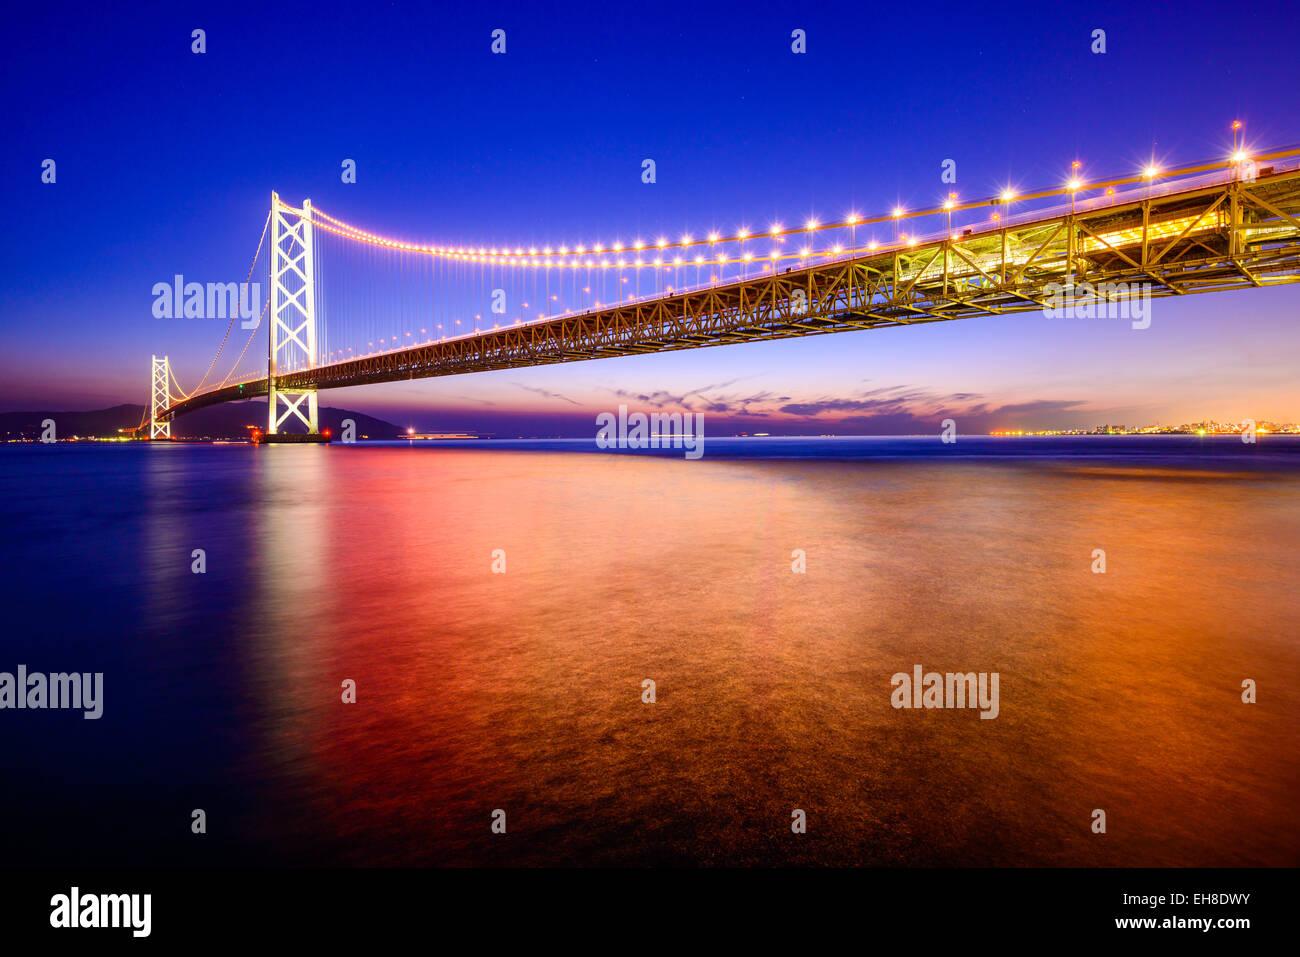 Kobe, Japan at the Okashi Kaikyo Ohashi Bridge spanning the Seto Inland Sea. - Stock Image